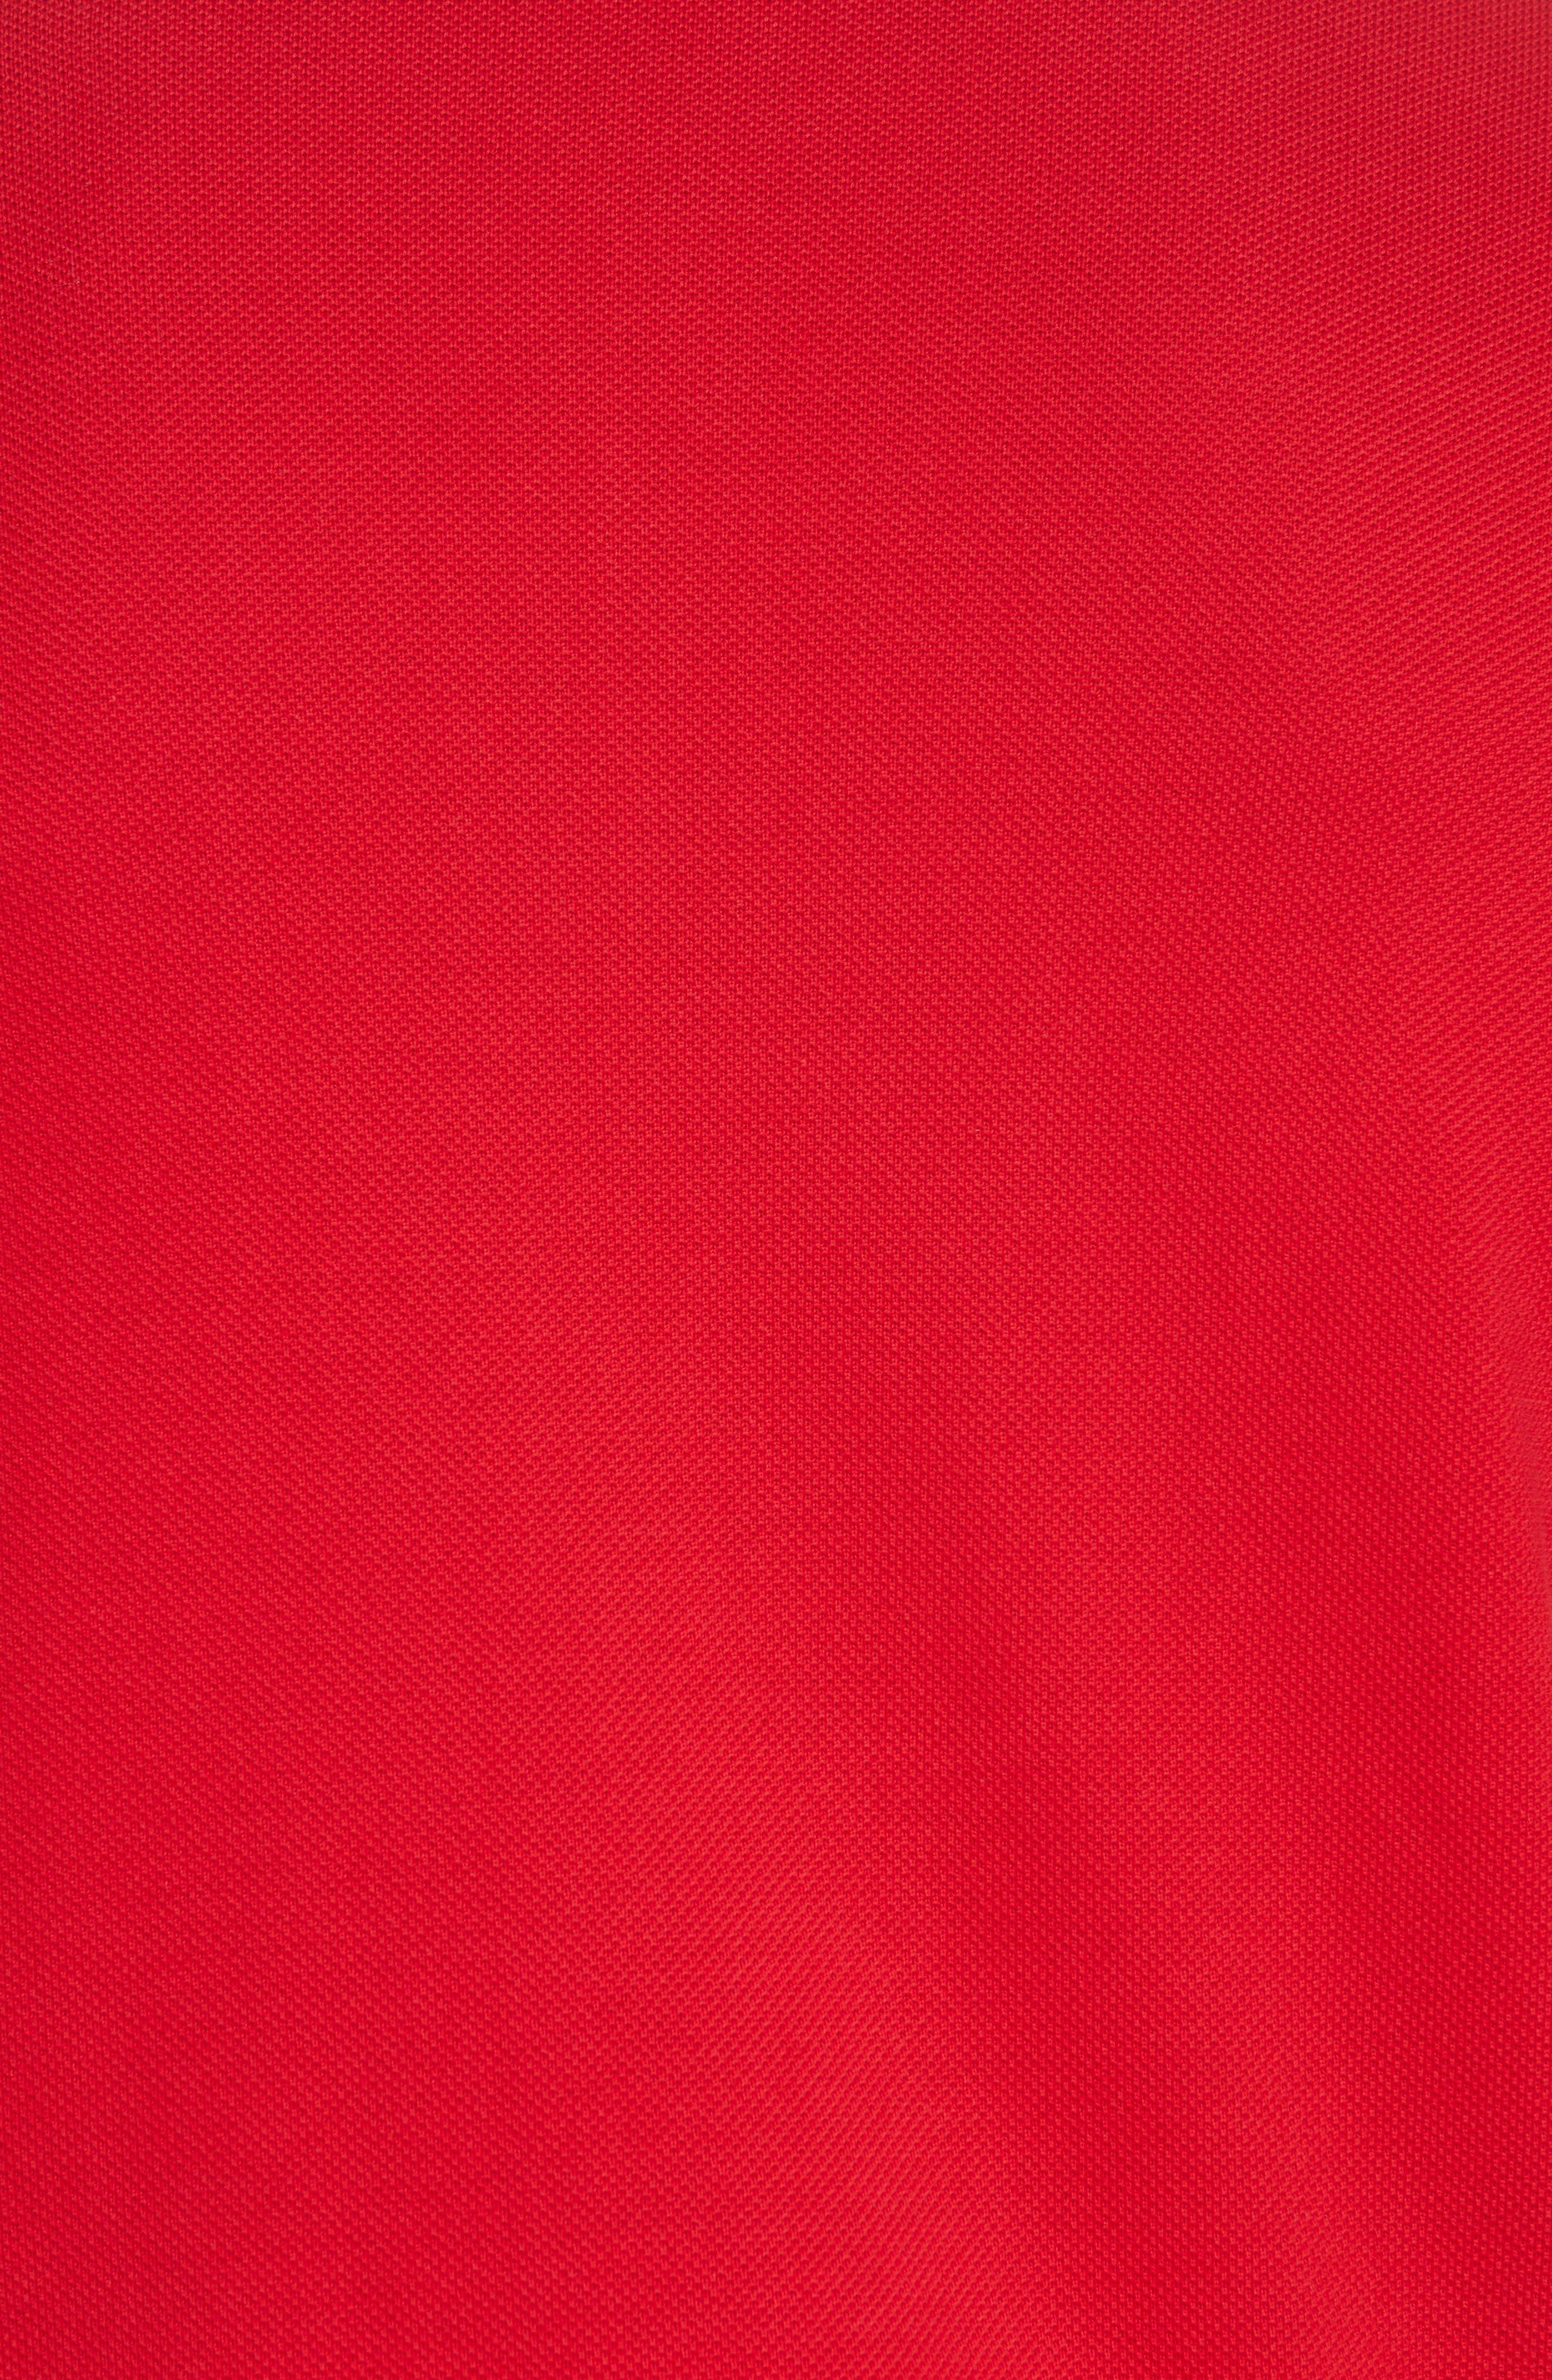 Hartford Piqué Polo,                             Alternate thumbnail 5, color,                             MILITARY RED